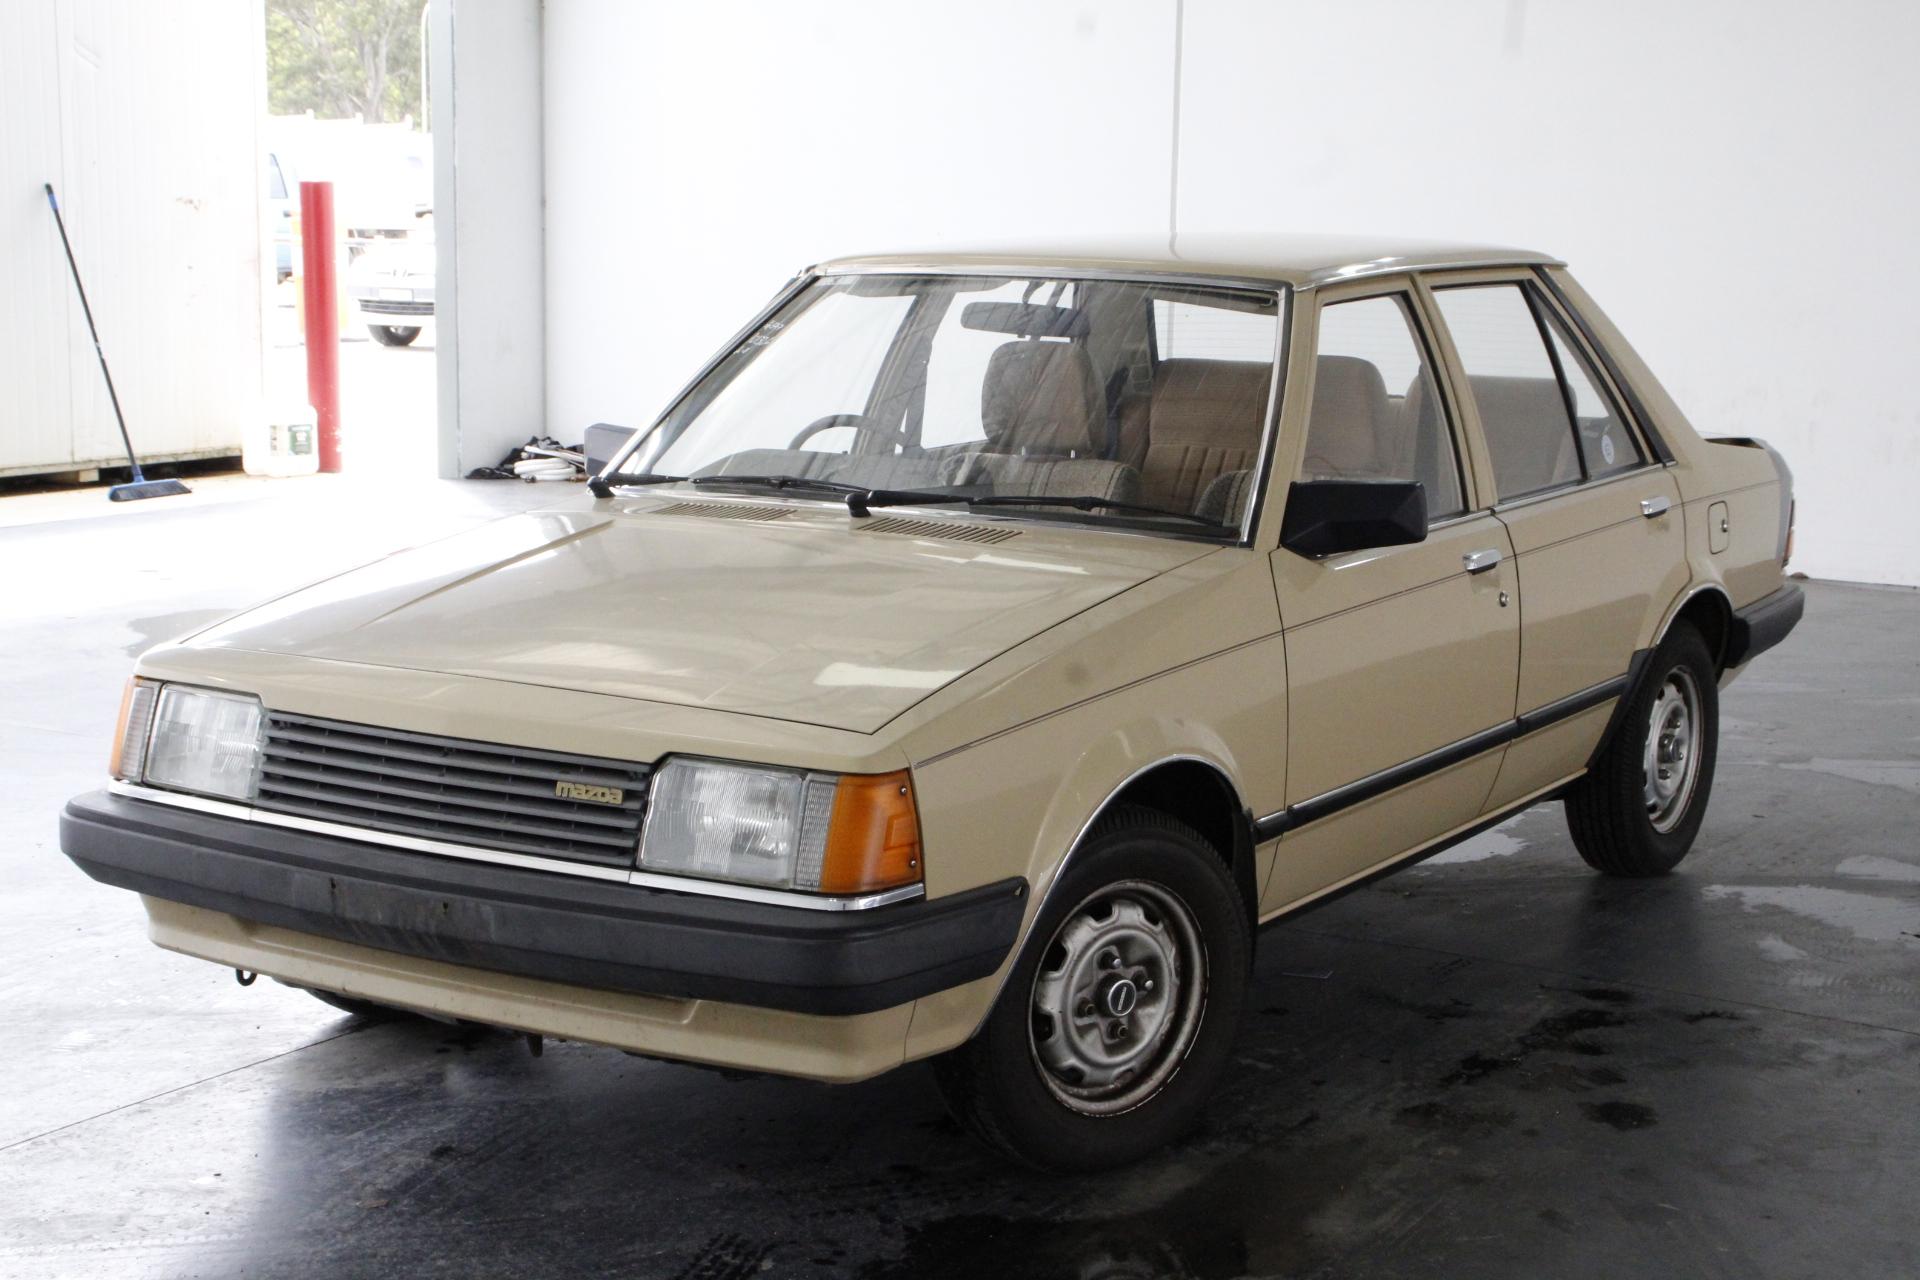 1982 Mazda 323 Automatic Sedan